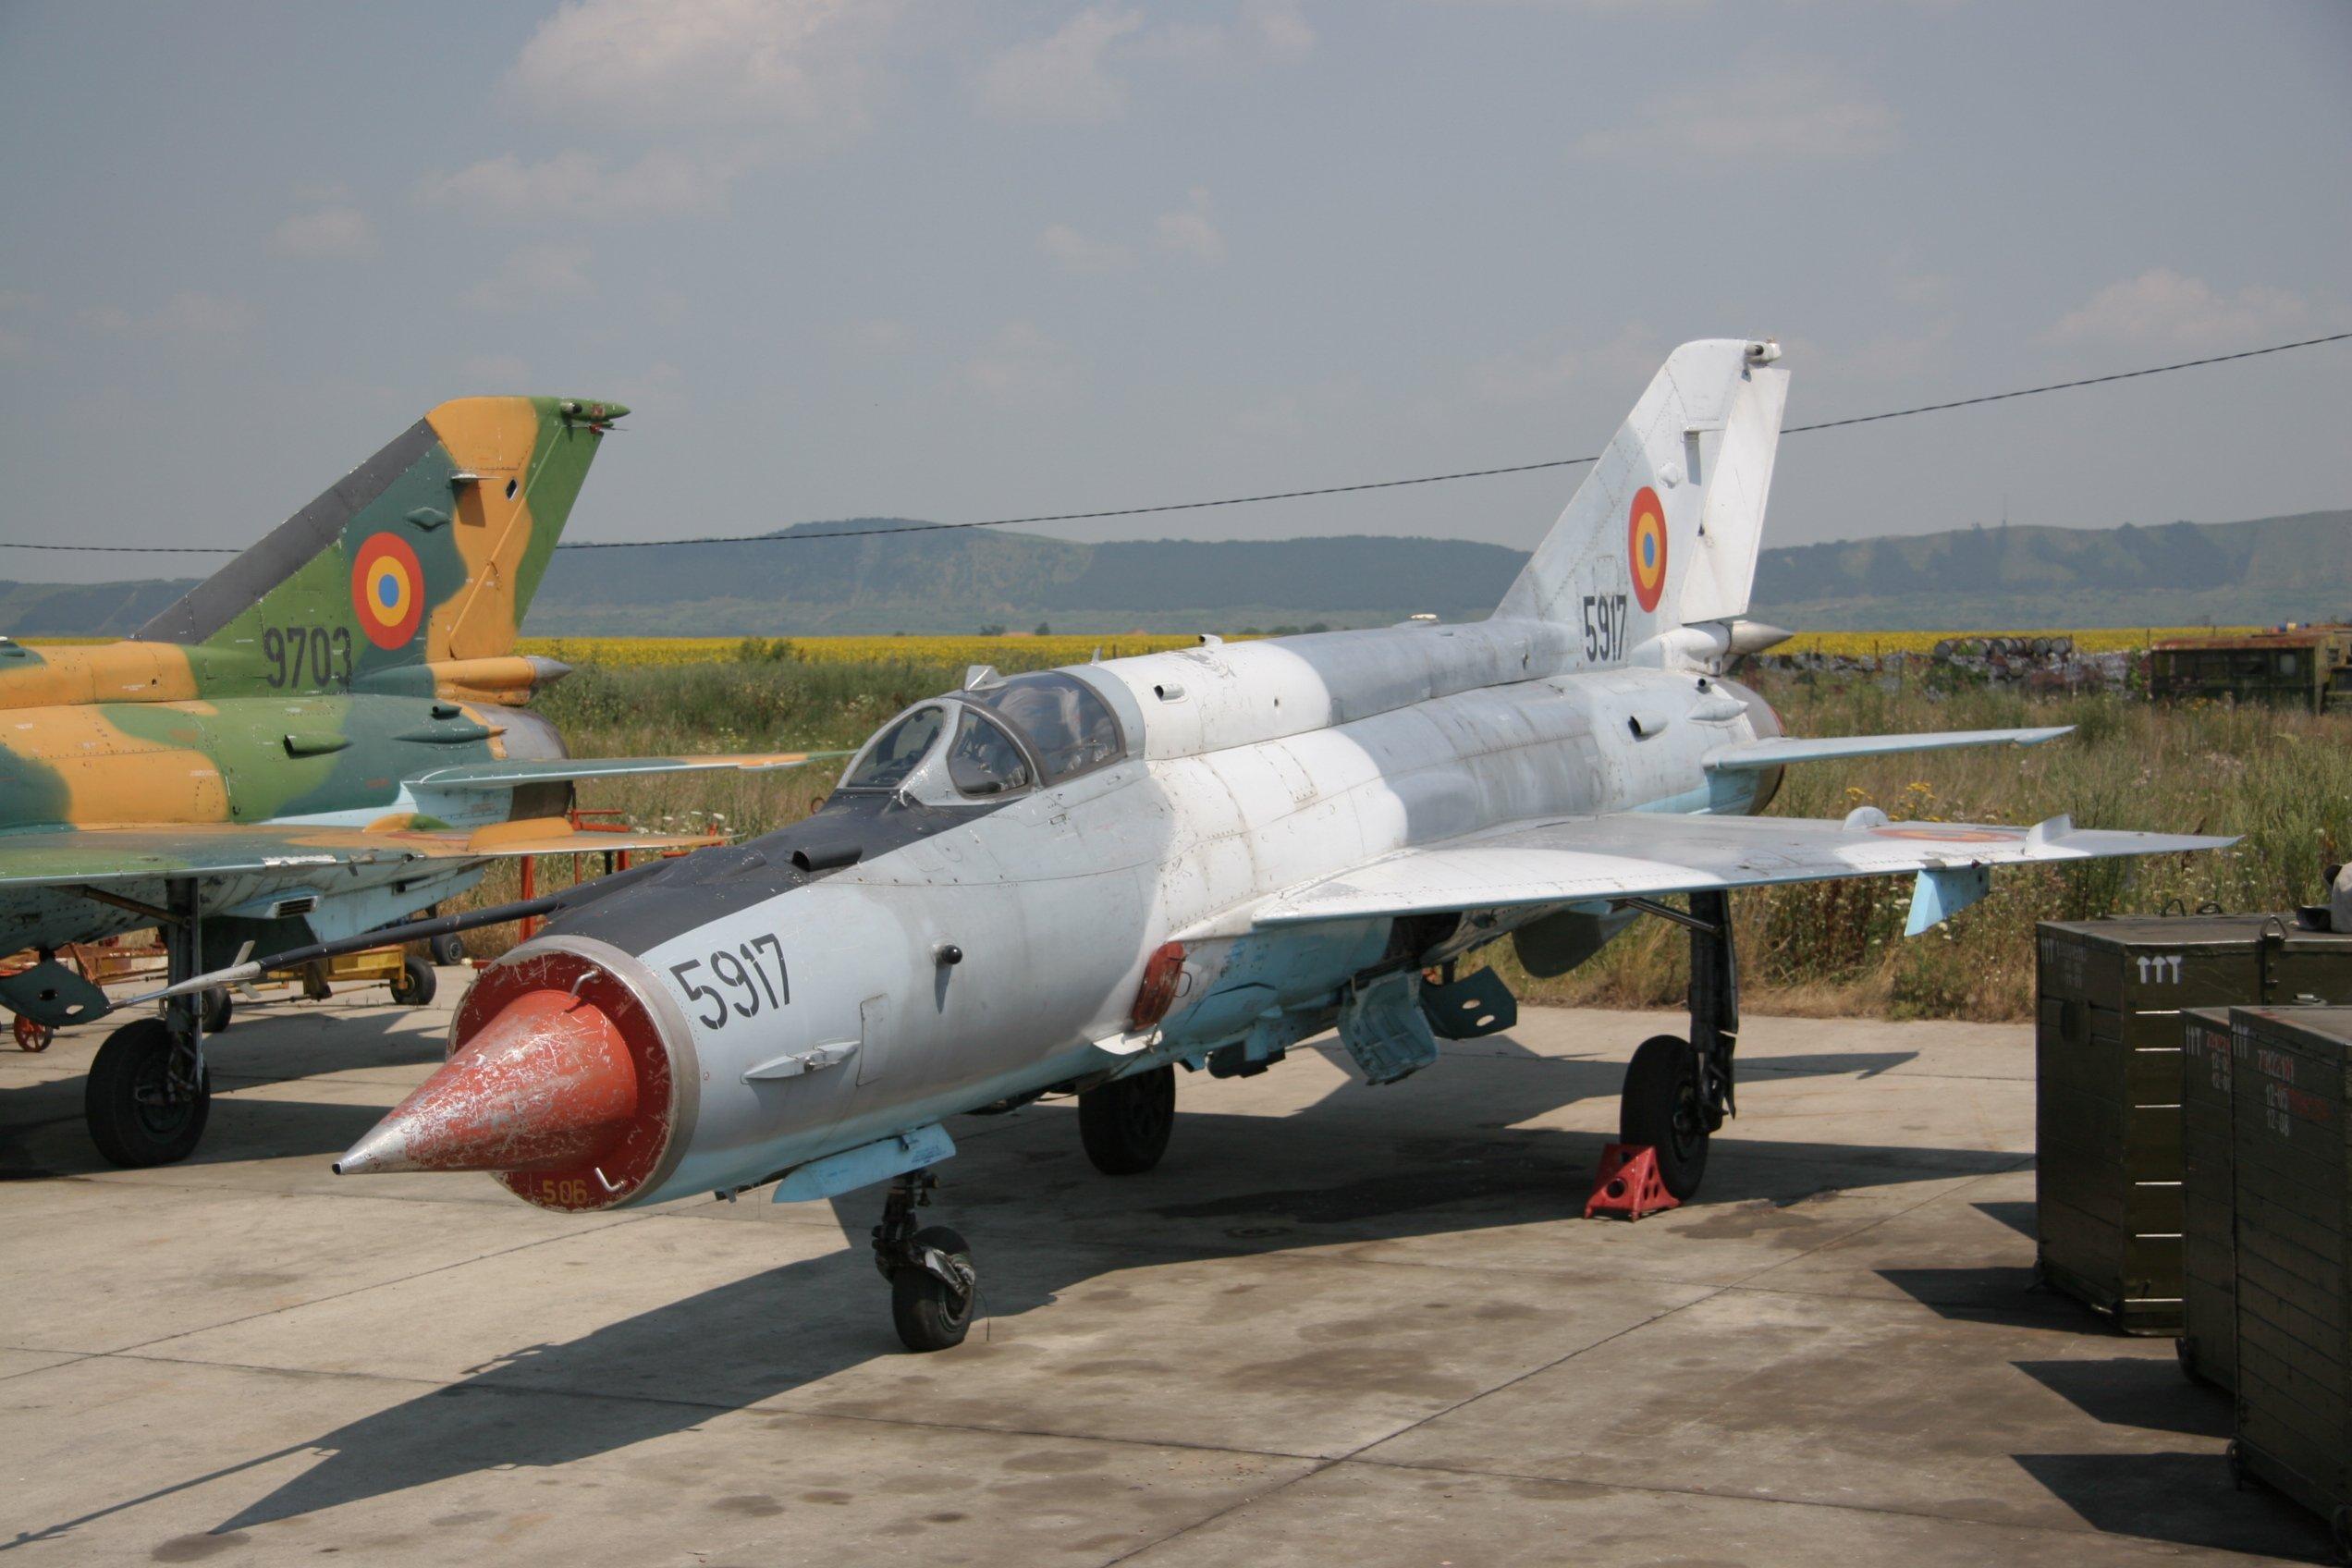 MiG-21 LanceR-C [Alan Warnes]